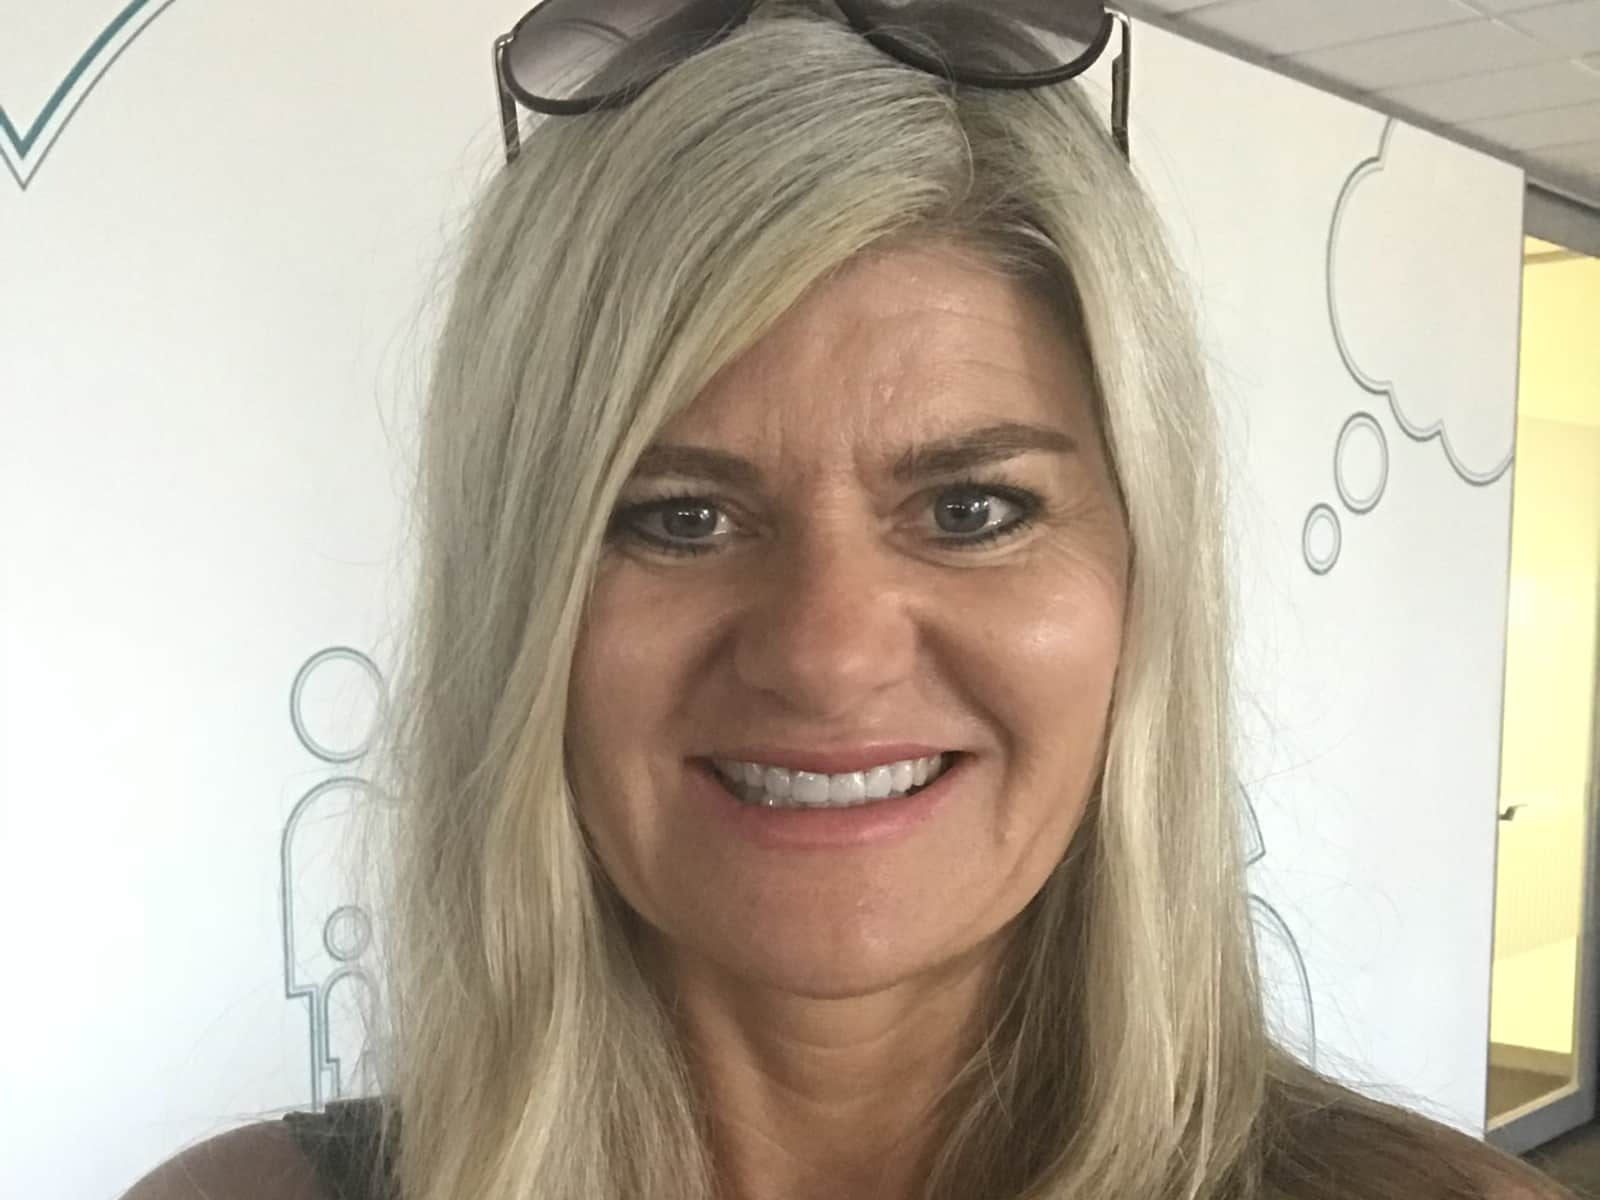 Karen from Ashford, United Kingdom